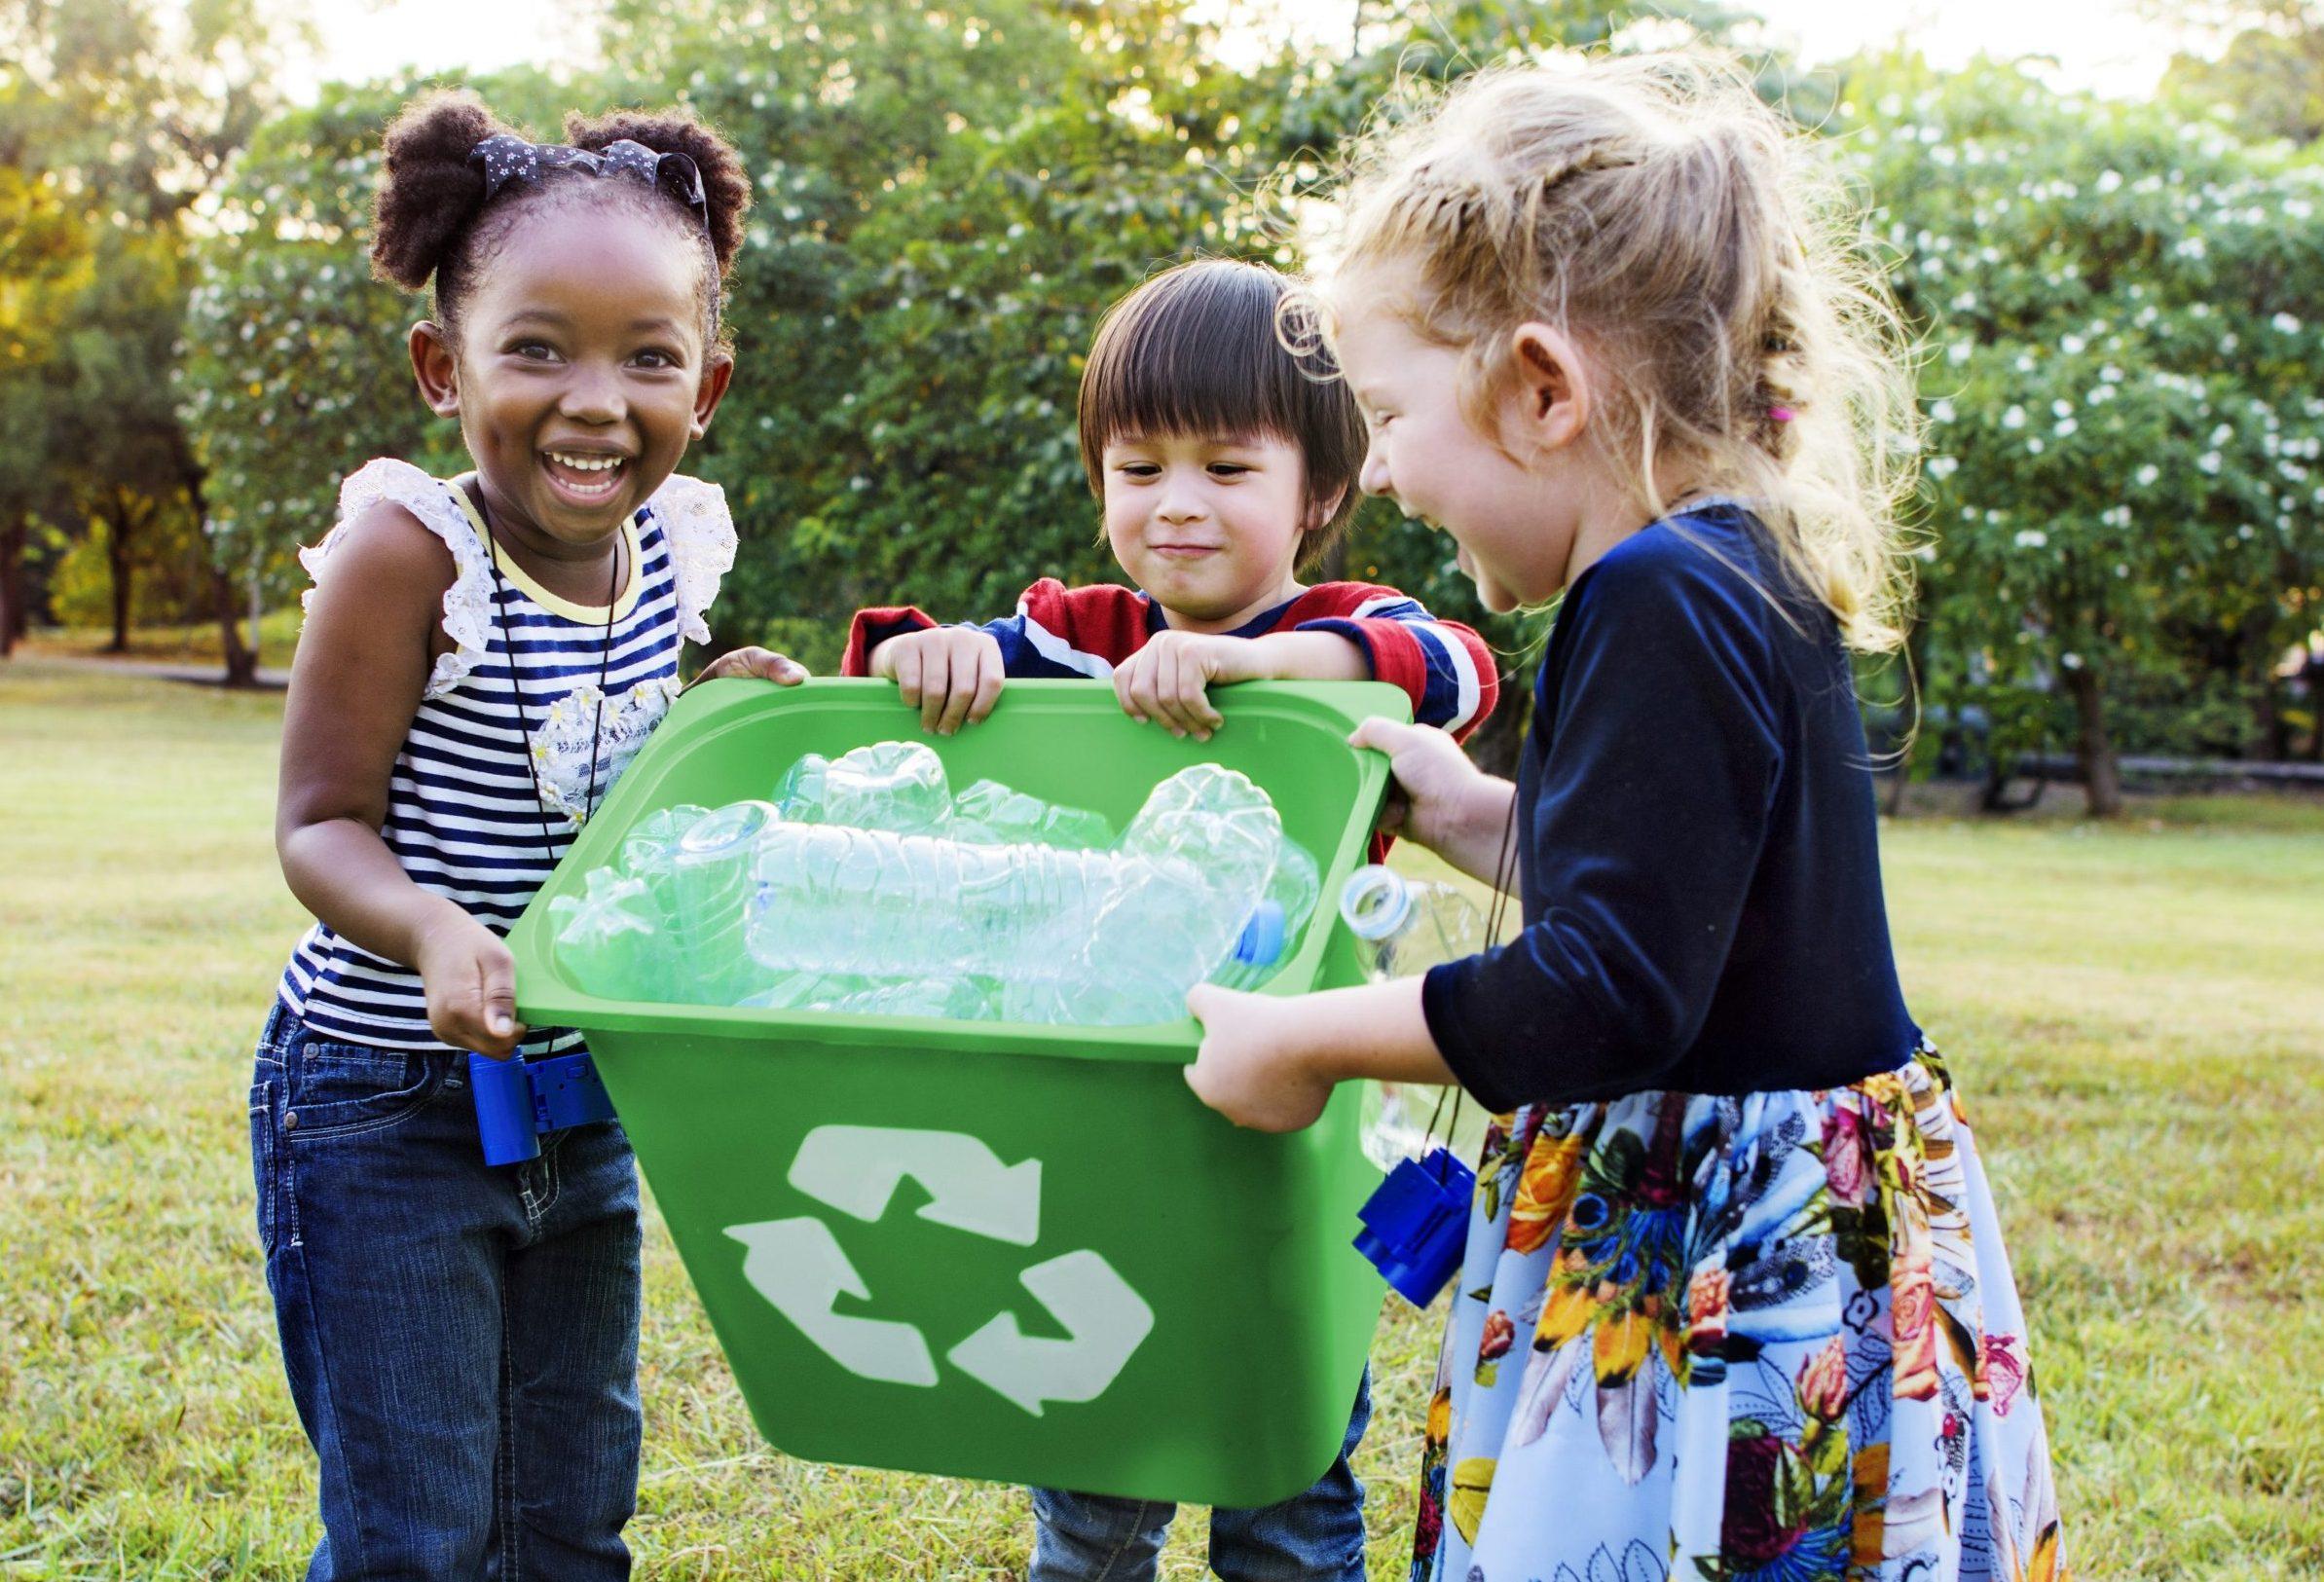 Global Recycling Day: Recycling spart jedes Jahr über 700 Millionen Tonnen Co2-Emissionen